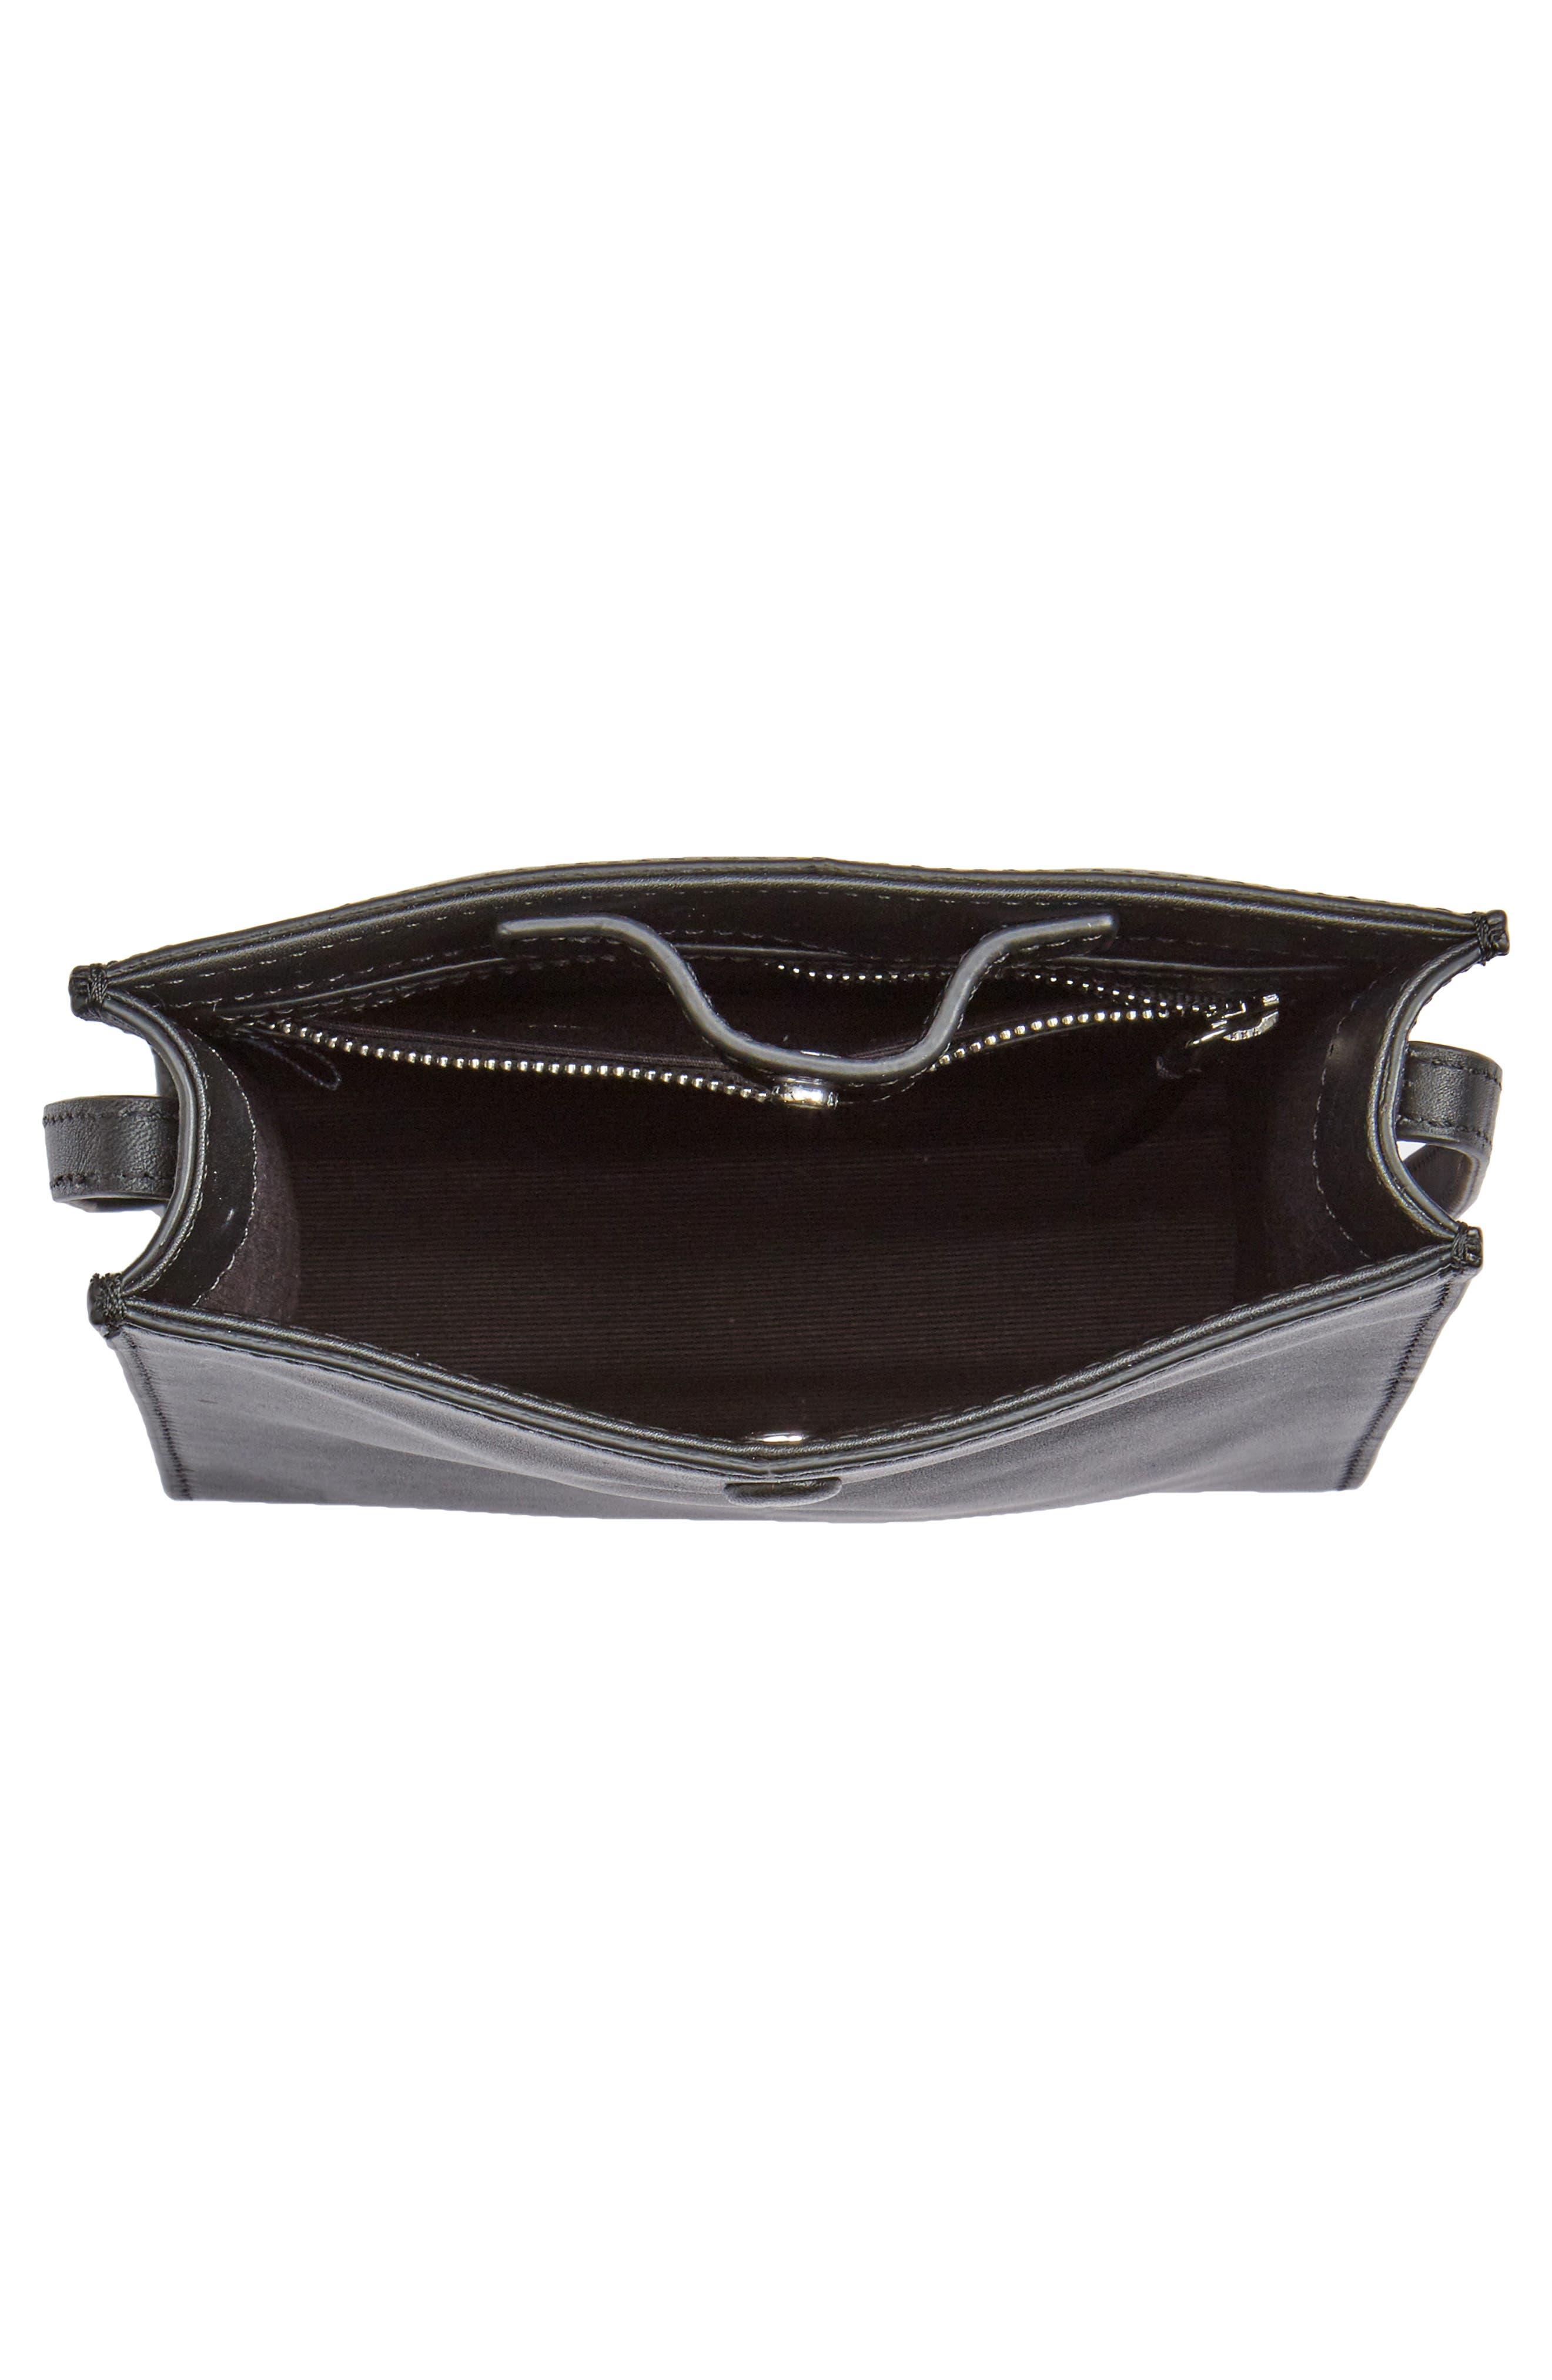 Camden Leather Crossbody Bag,                             Alternate thumbnail 4, color,                             001